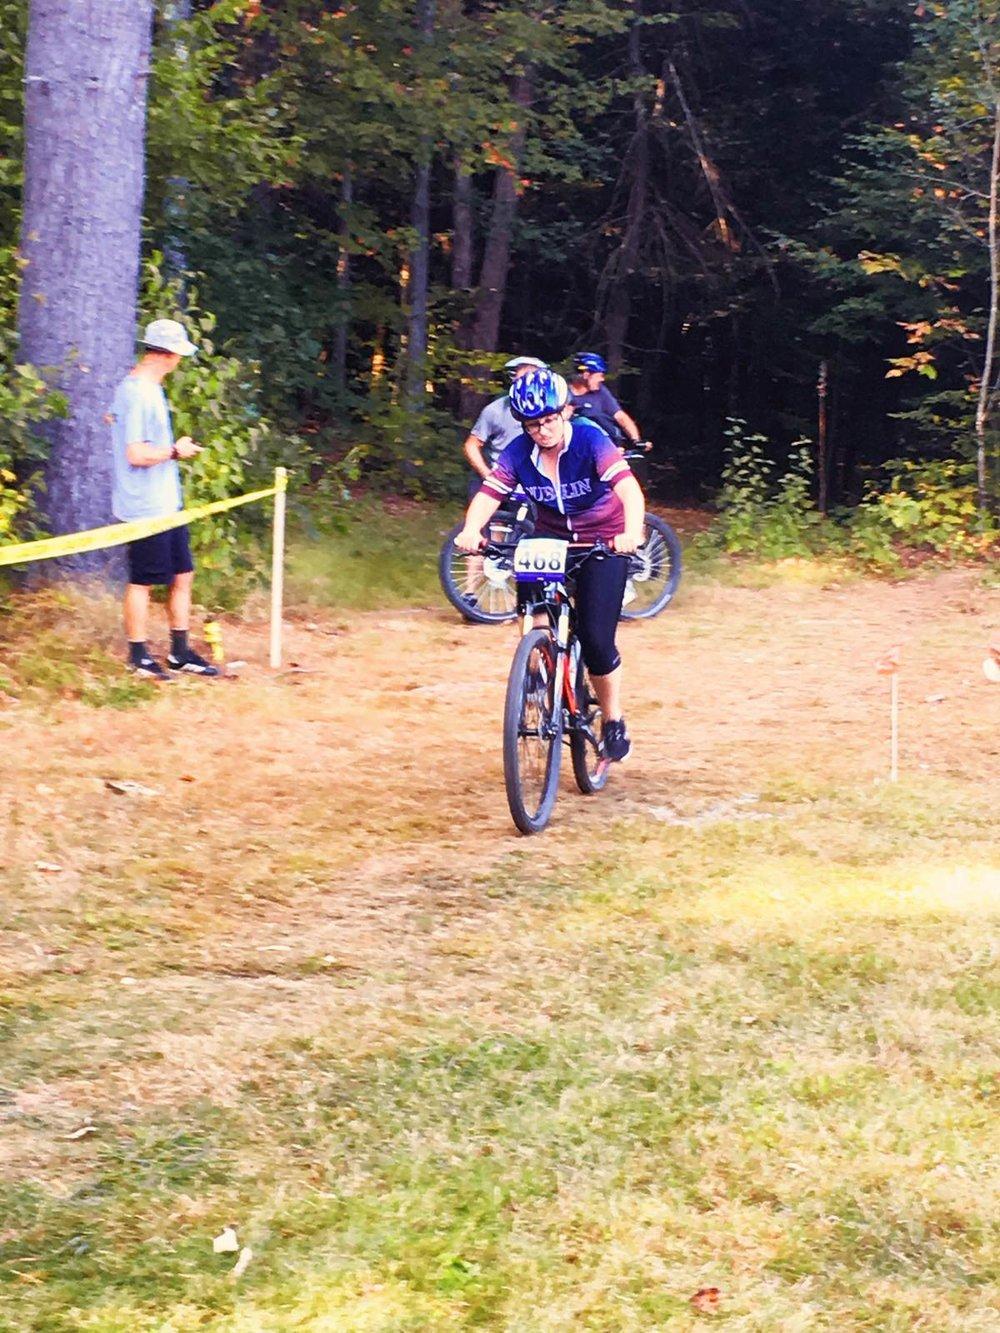 Mountain Biking at Vermont Academy - September 27, 2017  - 7950.JPG